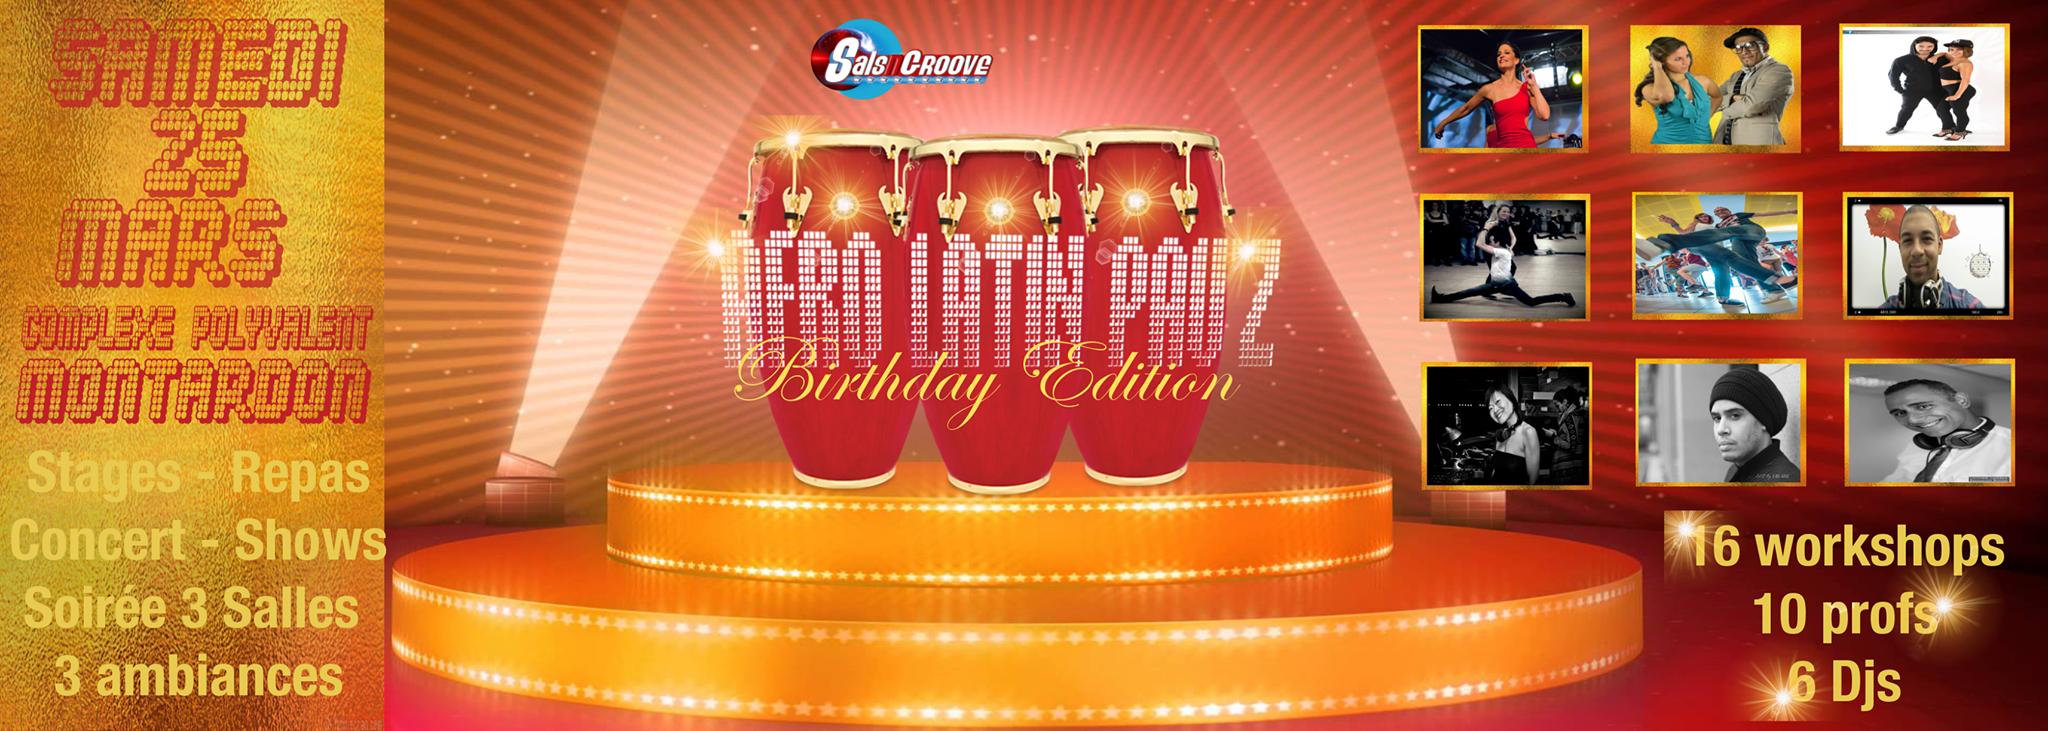 Afro Latin Pau'Z – Birthday Edition – 25 mars